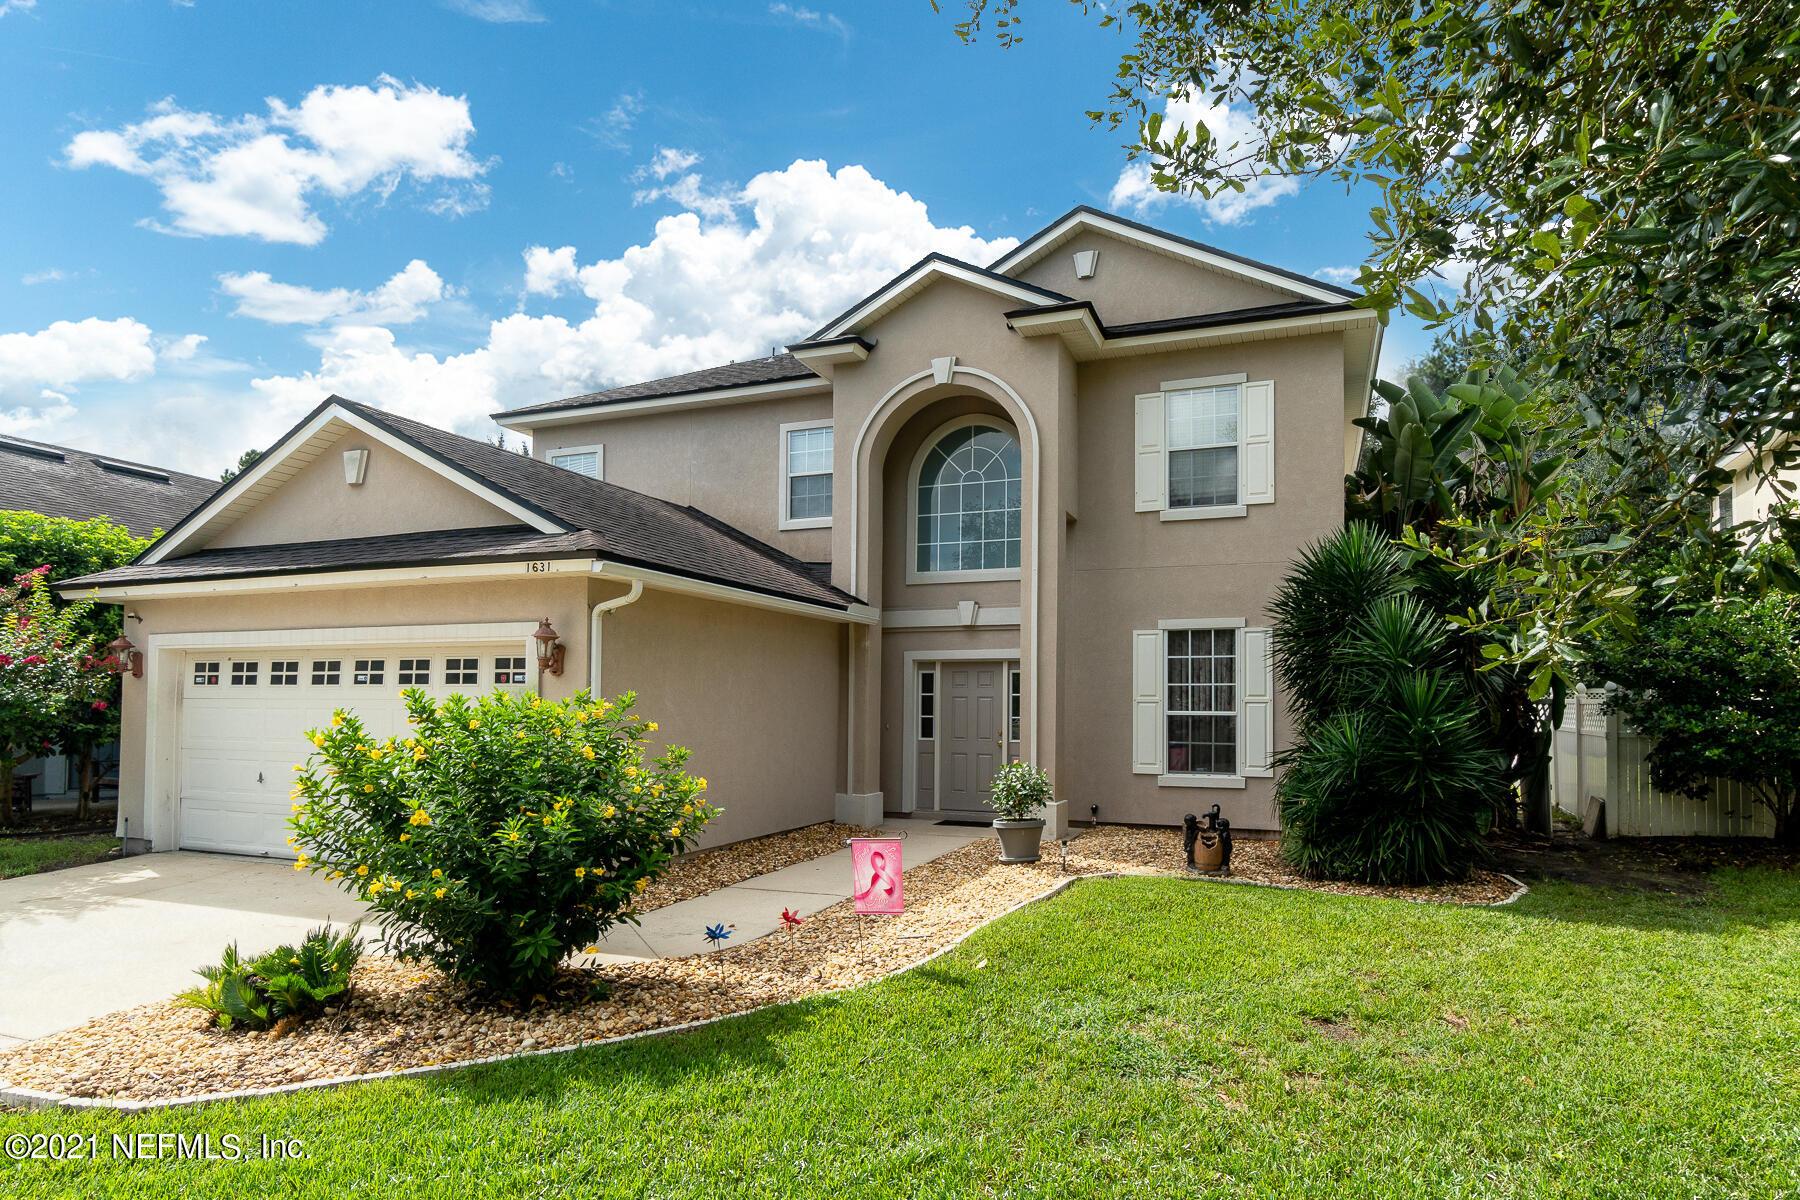 1631 CANOPY OAKS, ORANGE PARK, FLORIDA 32065, 4 Bedrooms Bedrooms, ,2 BathroomsBathrooms,Residential,For sale,CANOPY OAKS,1132006